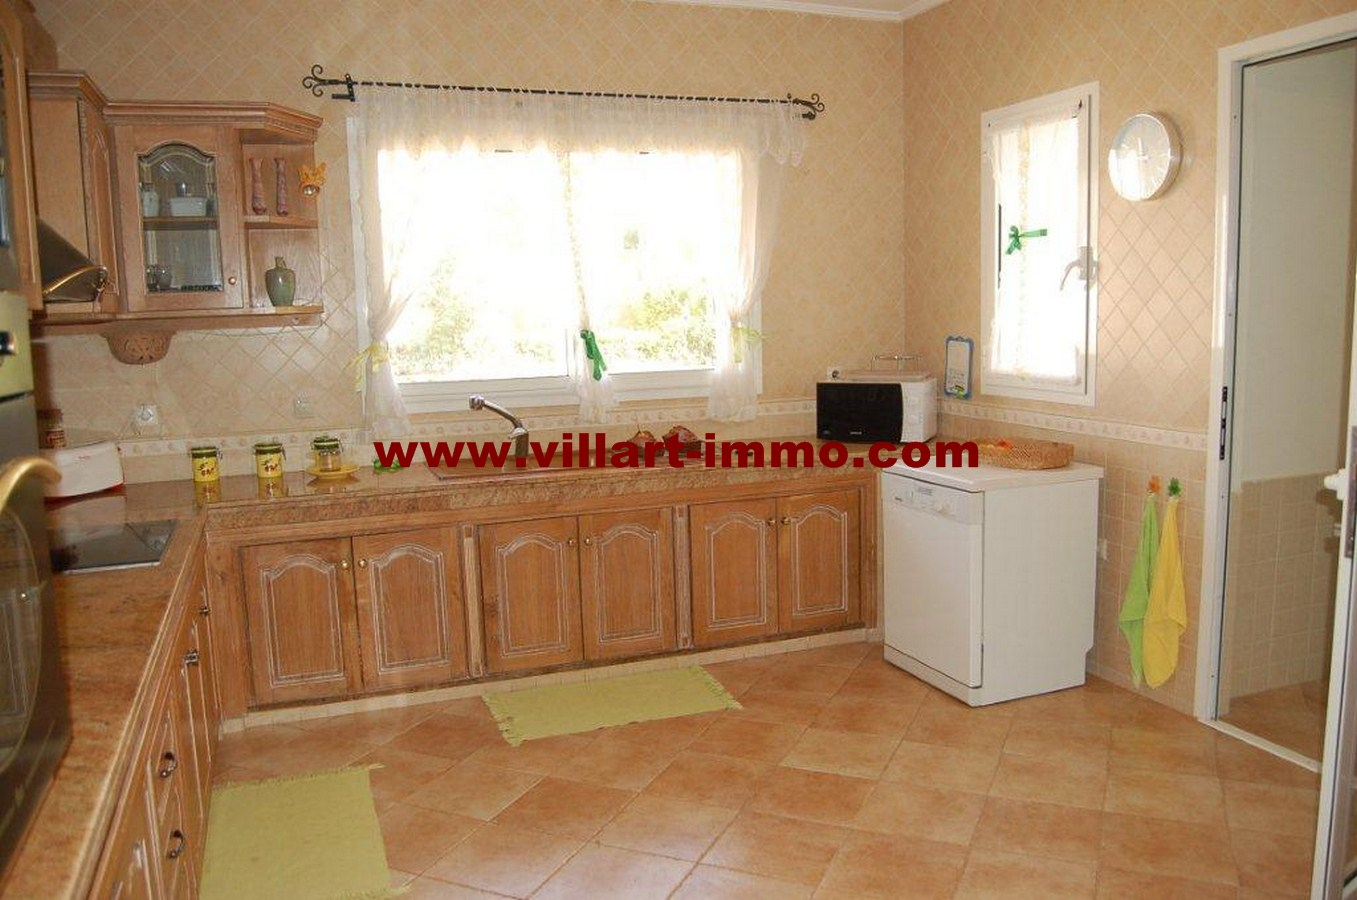 14-vente-appartement-tanger-la-montagne-cuisine-1-va452-villart-immo